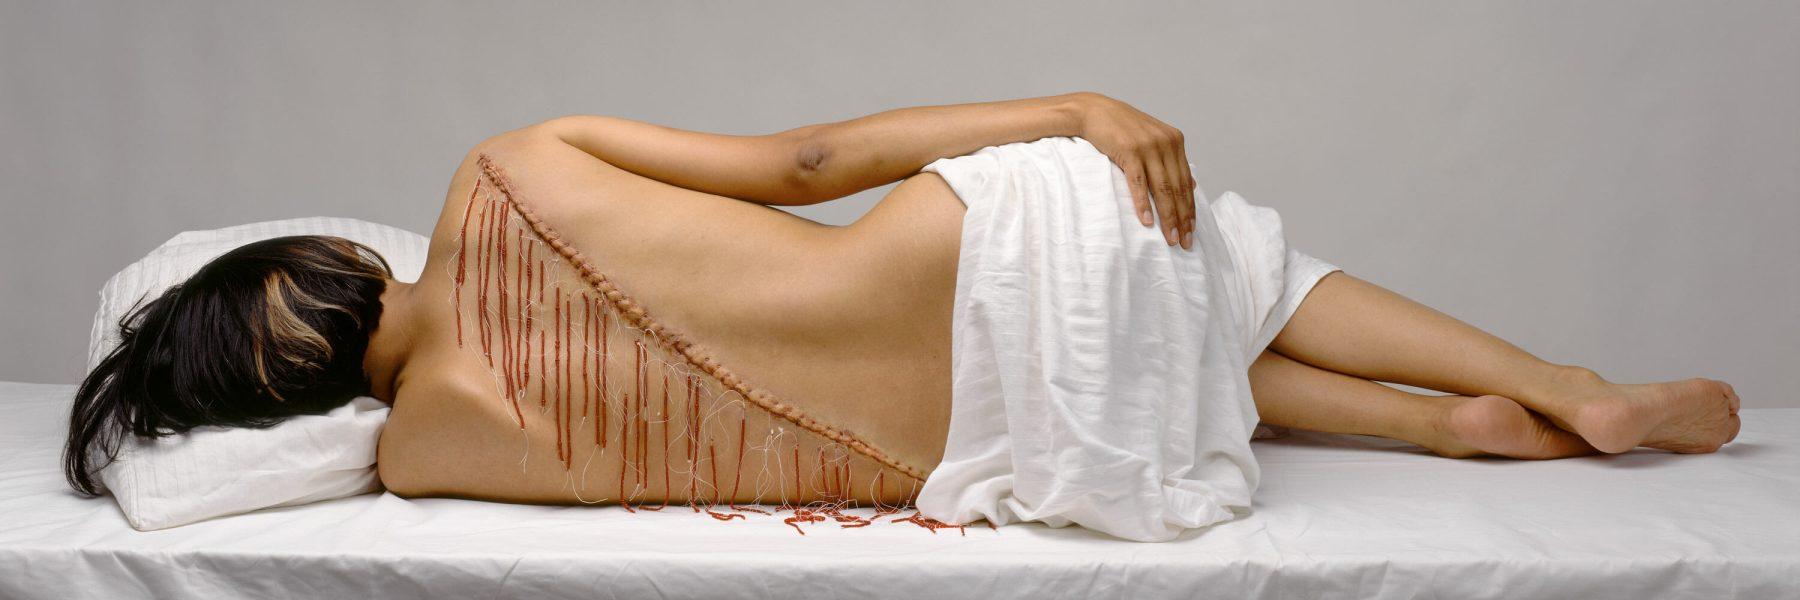 Rebecca Belmore, <i>Fringe</i> [Frange], 2008